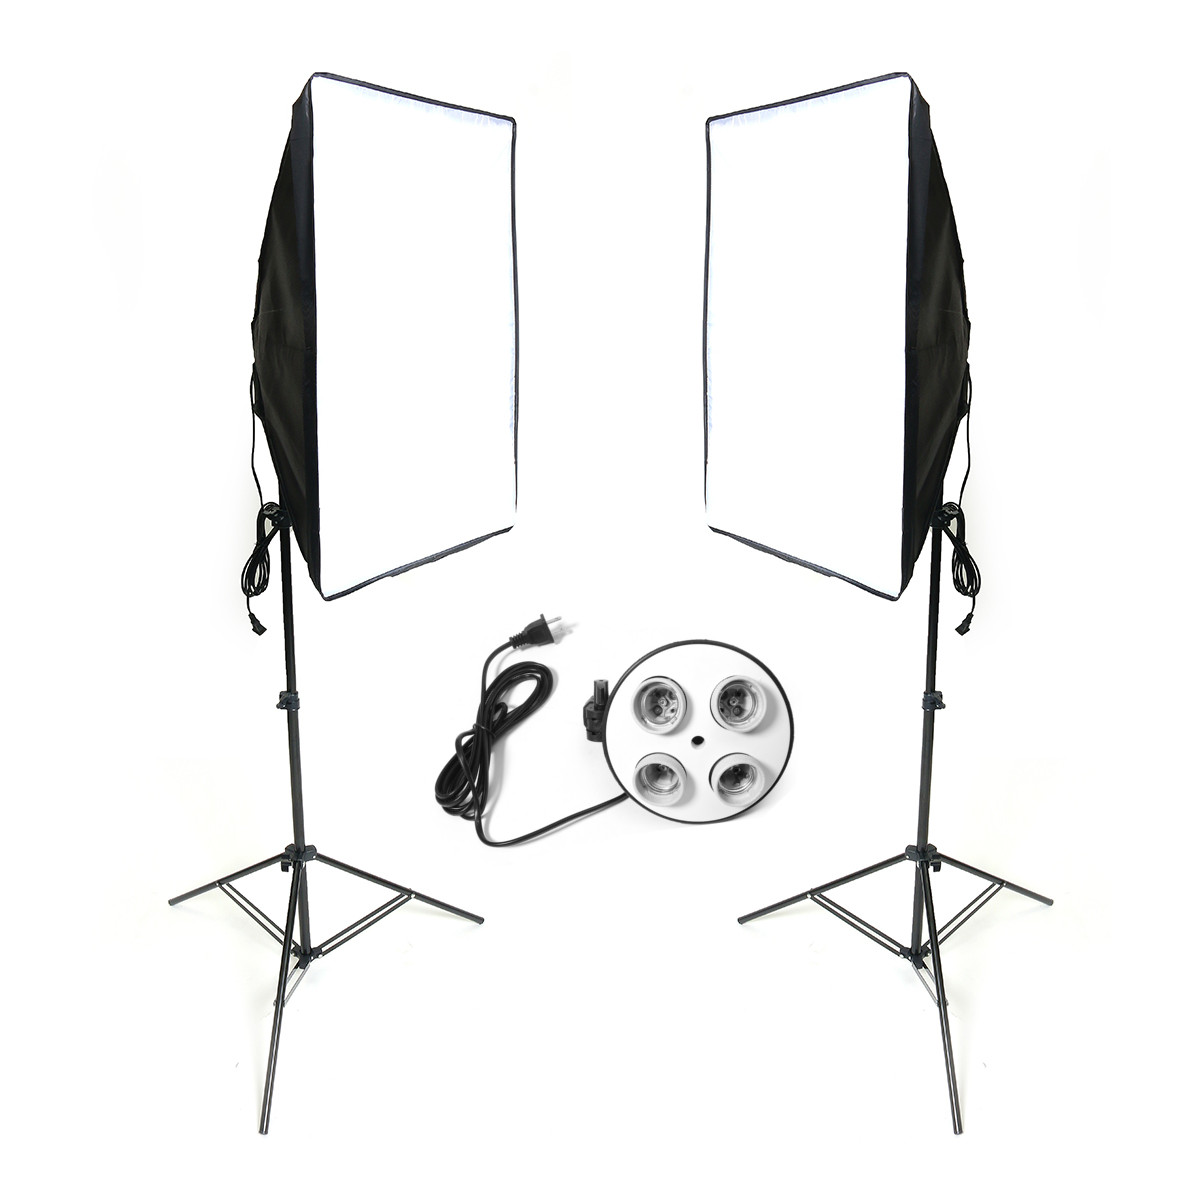 50x70cm Photography Softbox Lighting Kit Stand Tripod Camera Studio Equipment New Arrival softbox studio lighting softbox light lambed 80cm cotans round cotans photographic equipment 4 flock printing background cd50